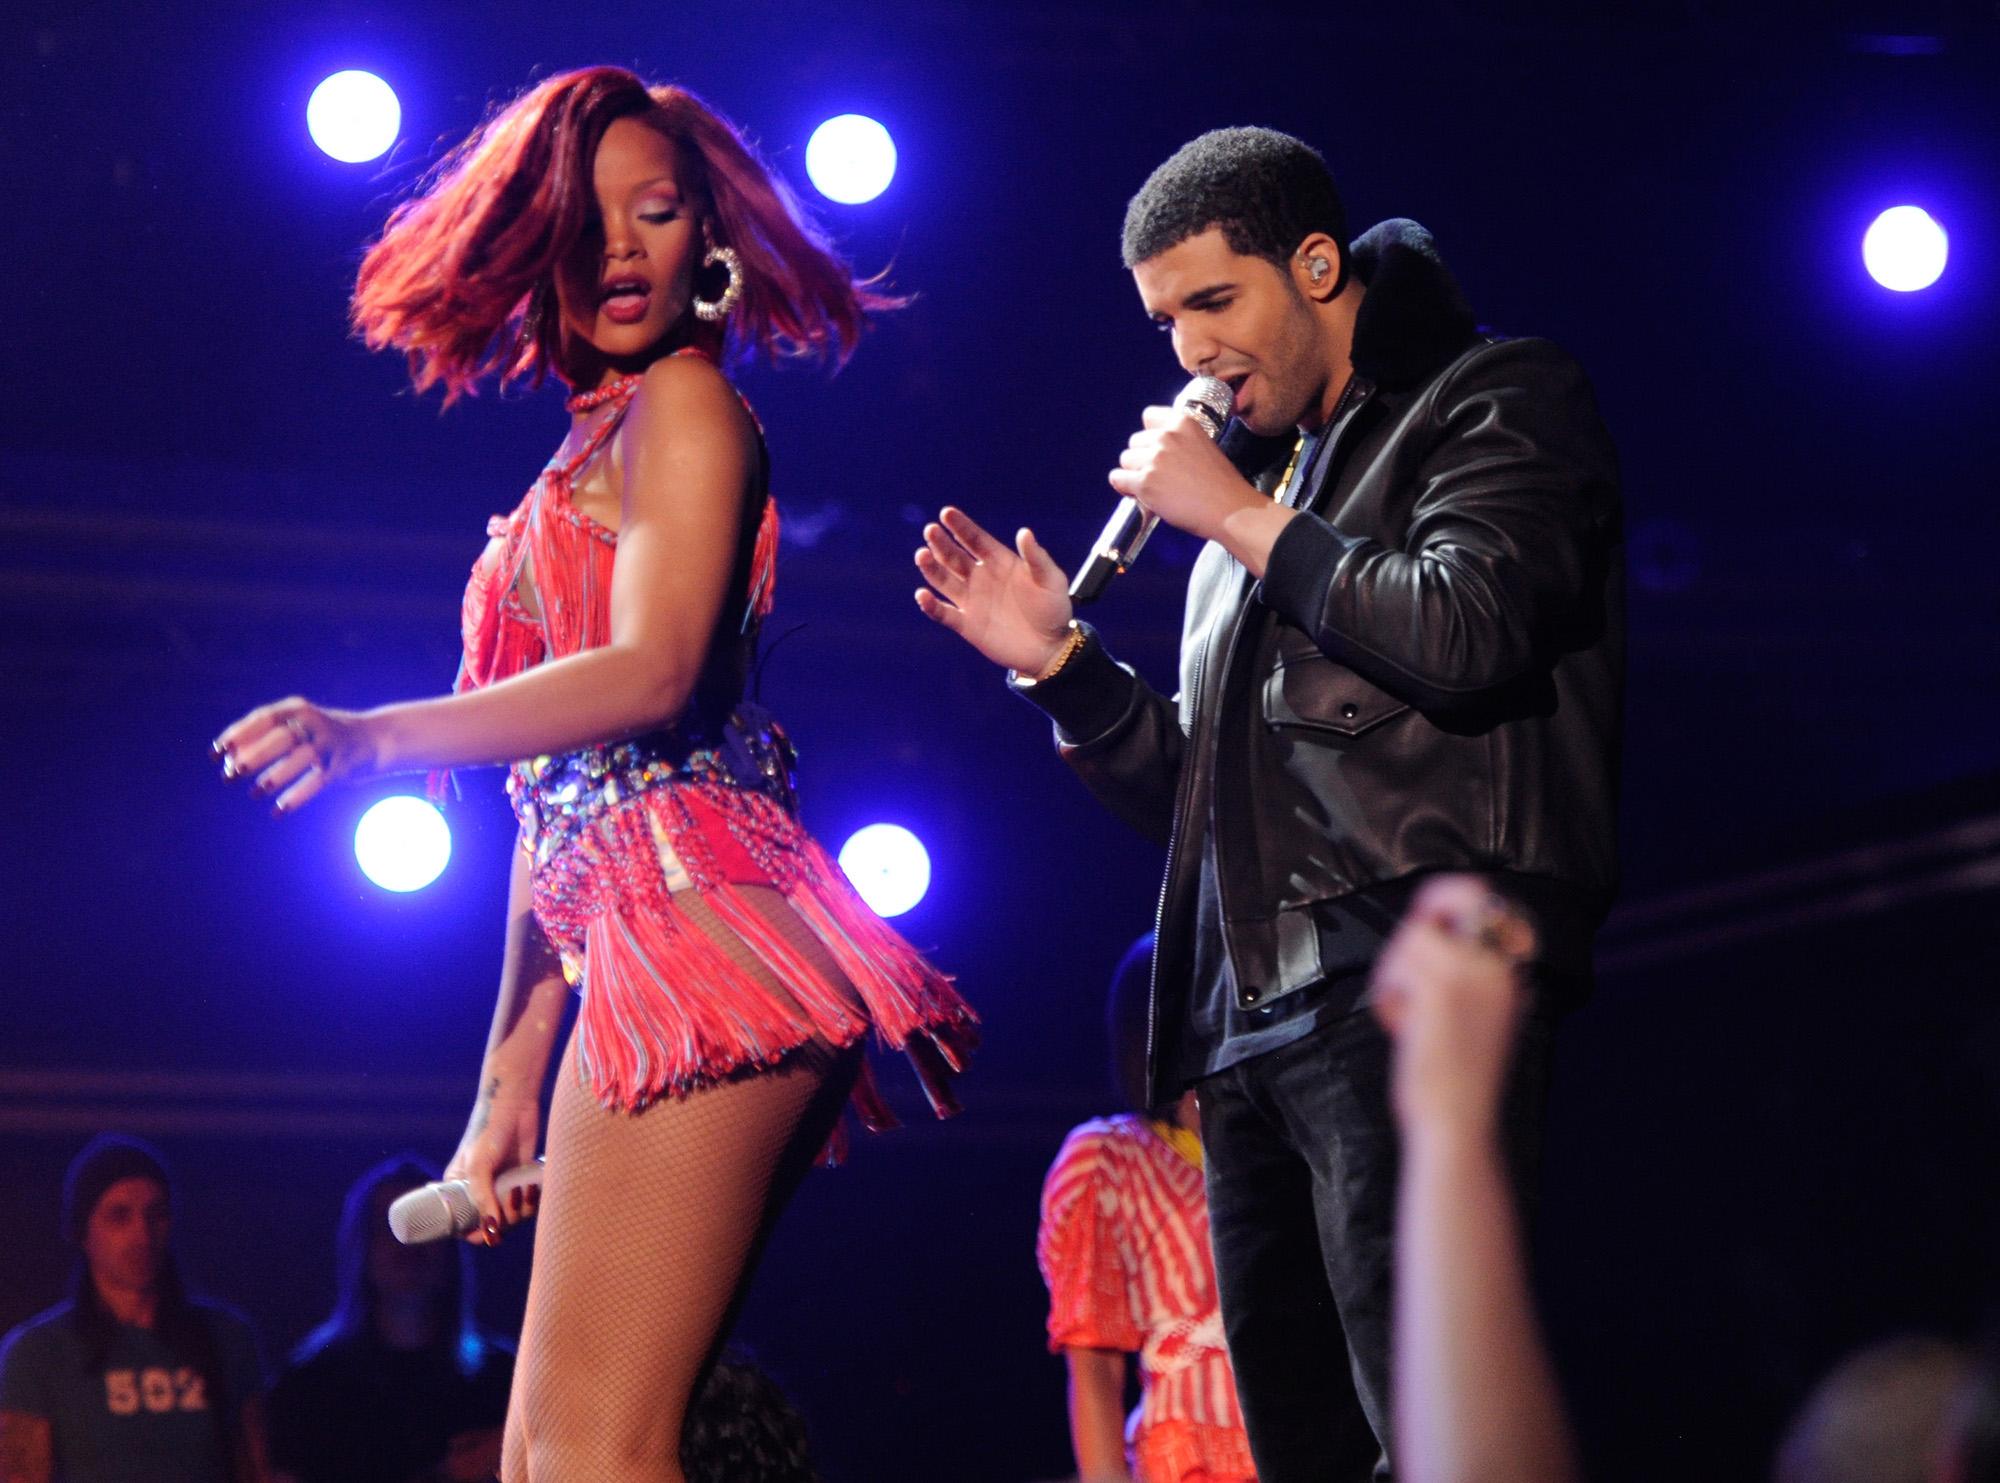 Drake rihanna relationship